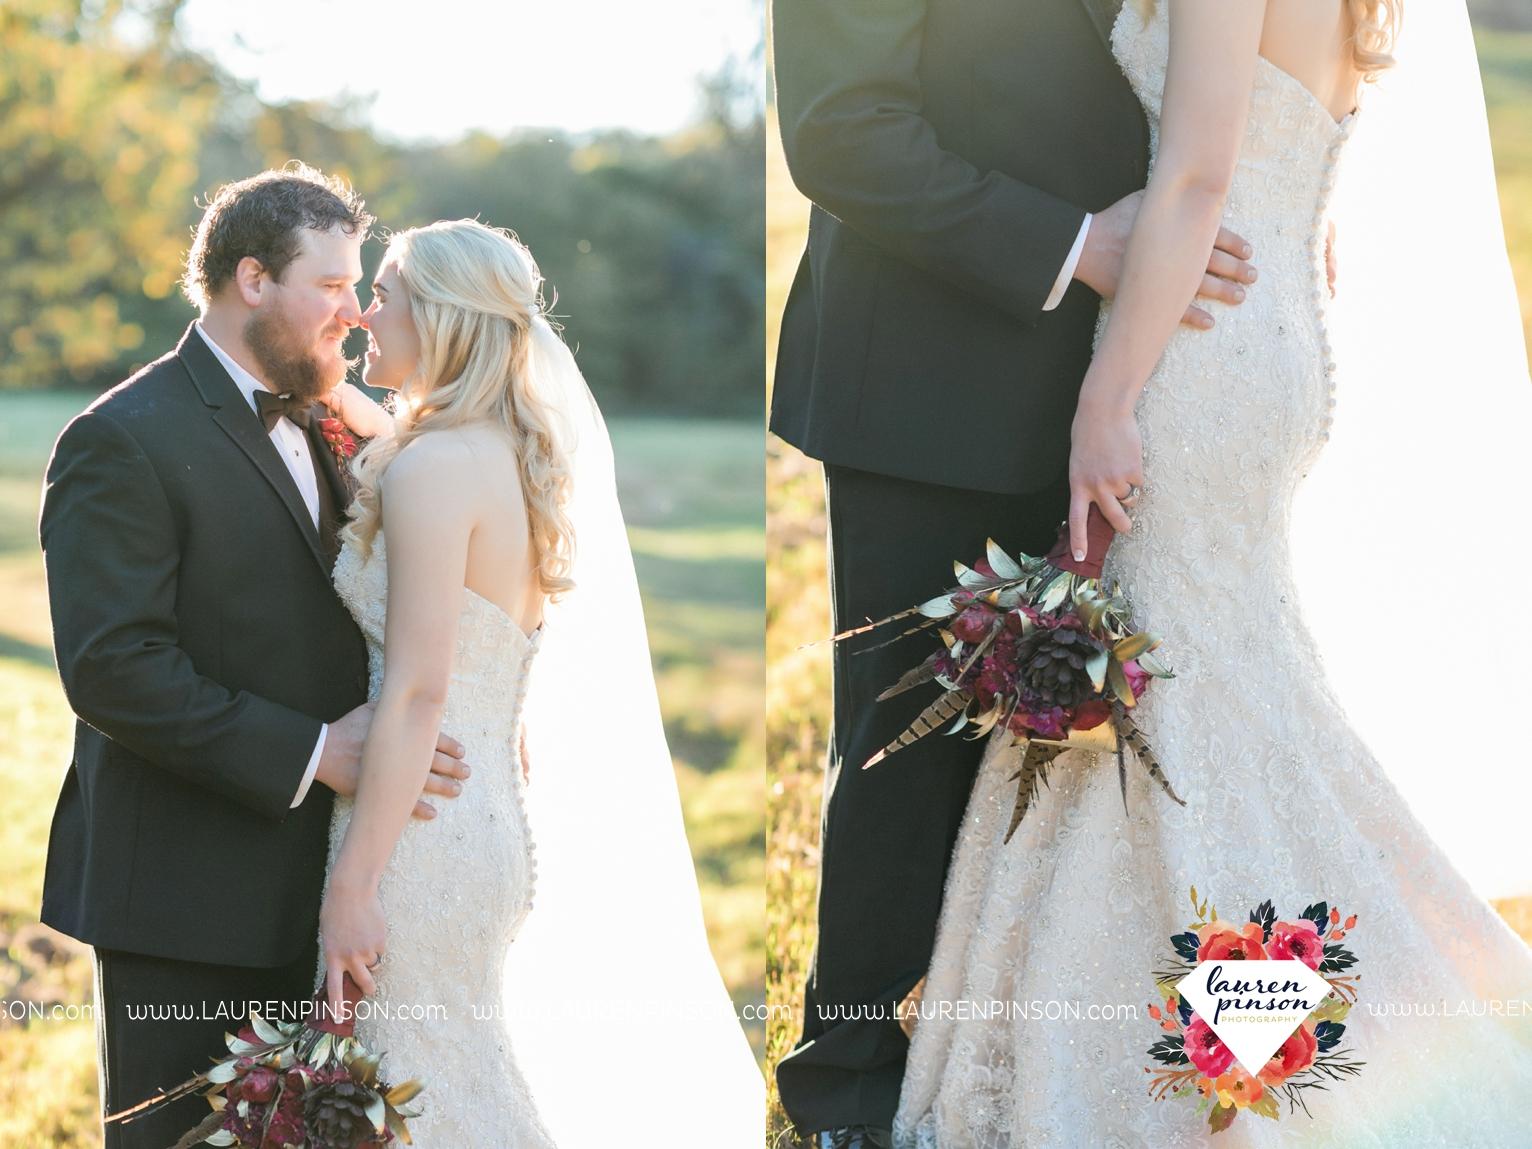 rustic-wichita-falls-texas-wedding-photographer-gold-glam-mayfield-events-market-street-united-allue-bridals-fall_1767.jpg